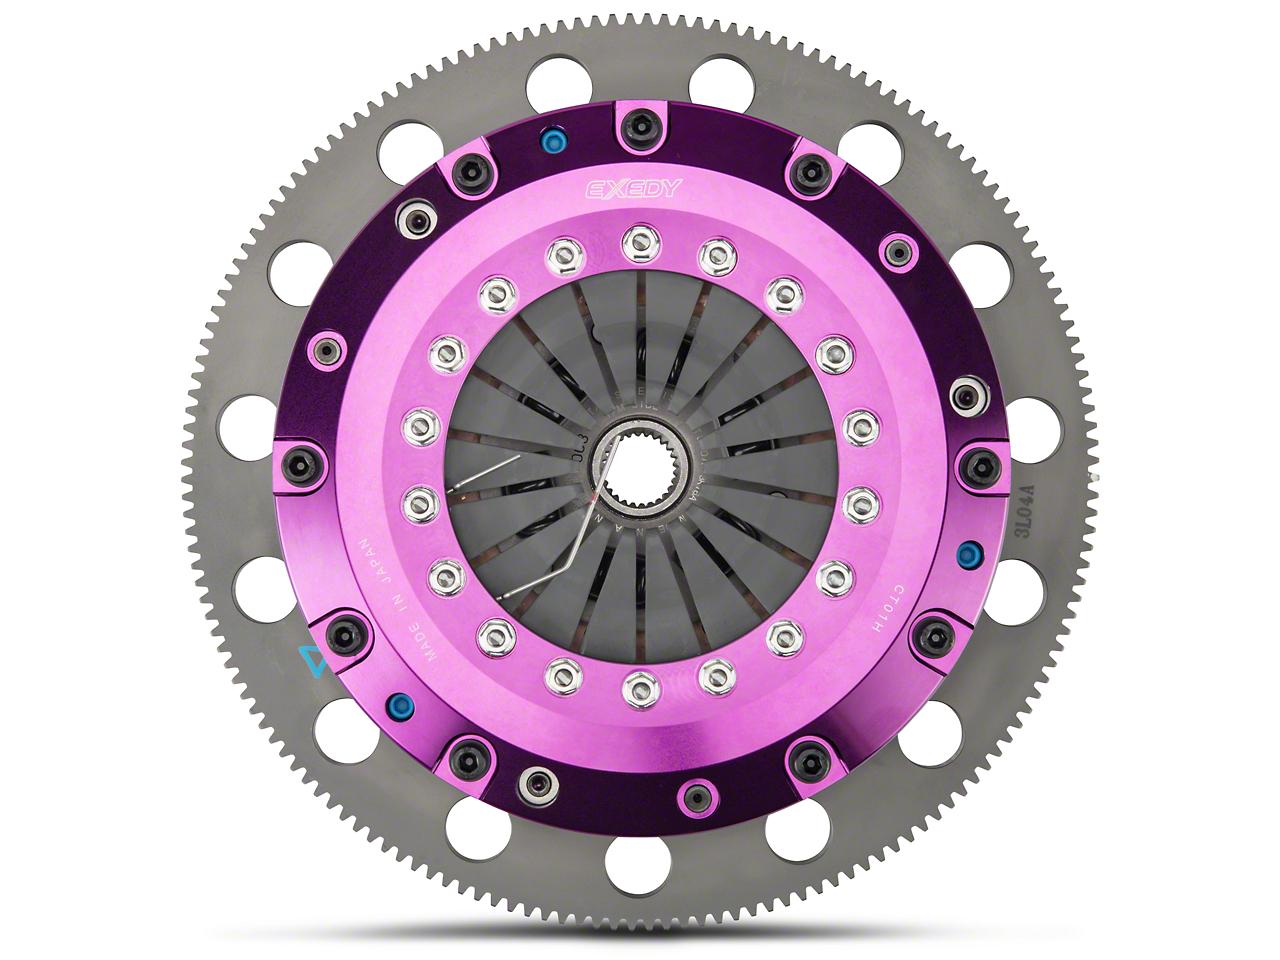 Exedy Hyper Twin Disc Clutch w/ Flywheel - 26 Spline - 8-Bolt (96-04 Cobra, Mach 1; 07-10 GT500)